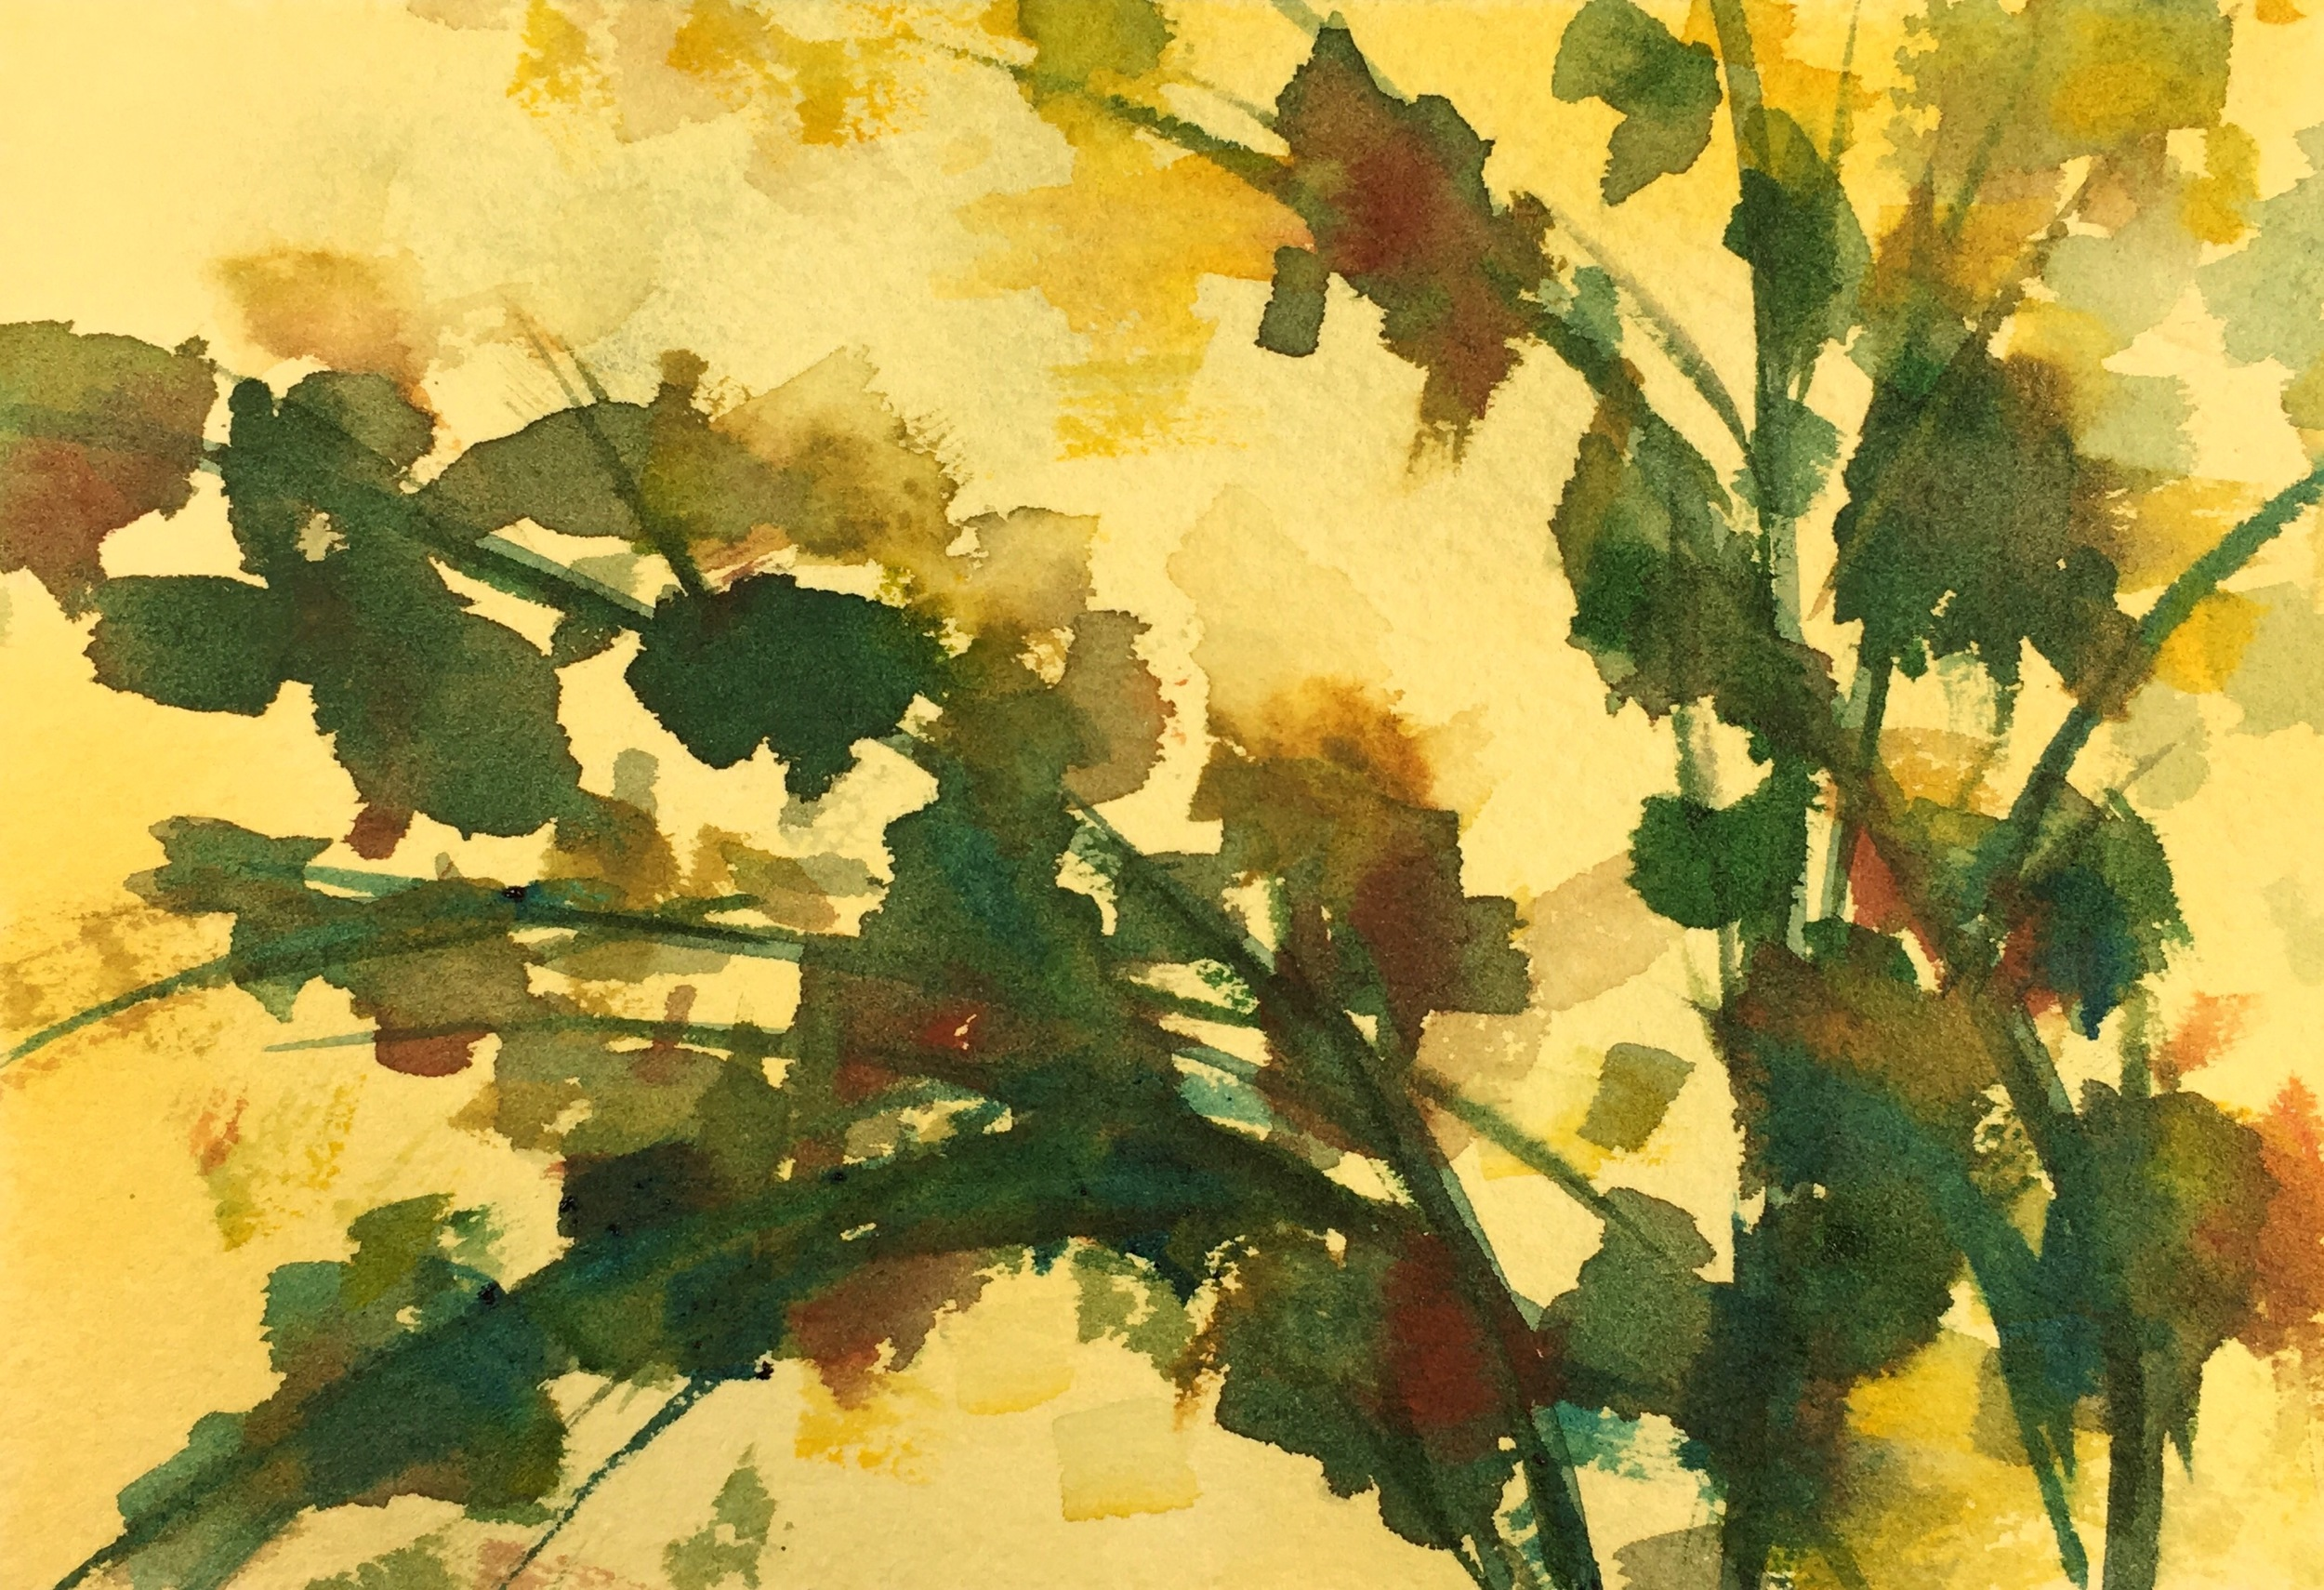 [Day93 of 100] Foliage